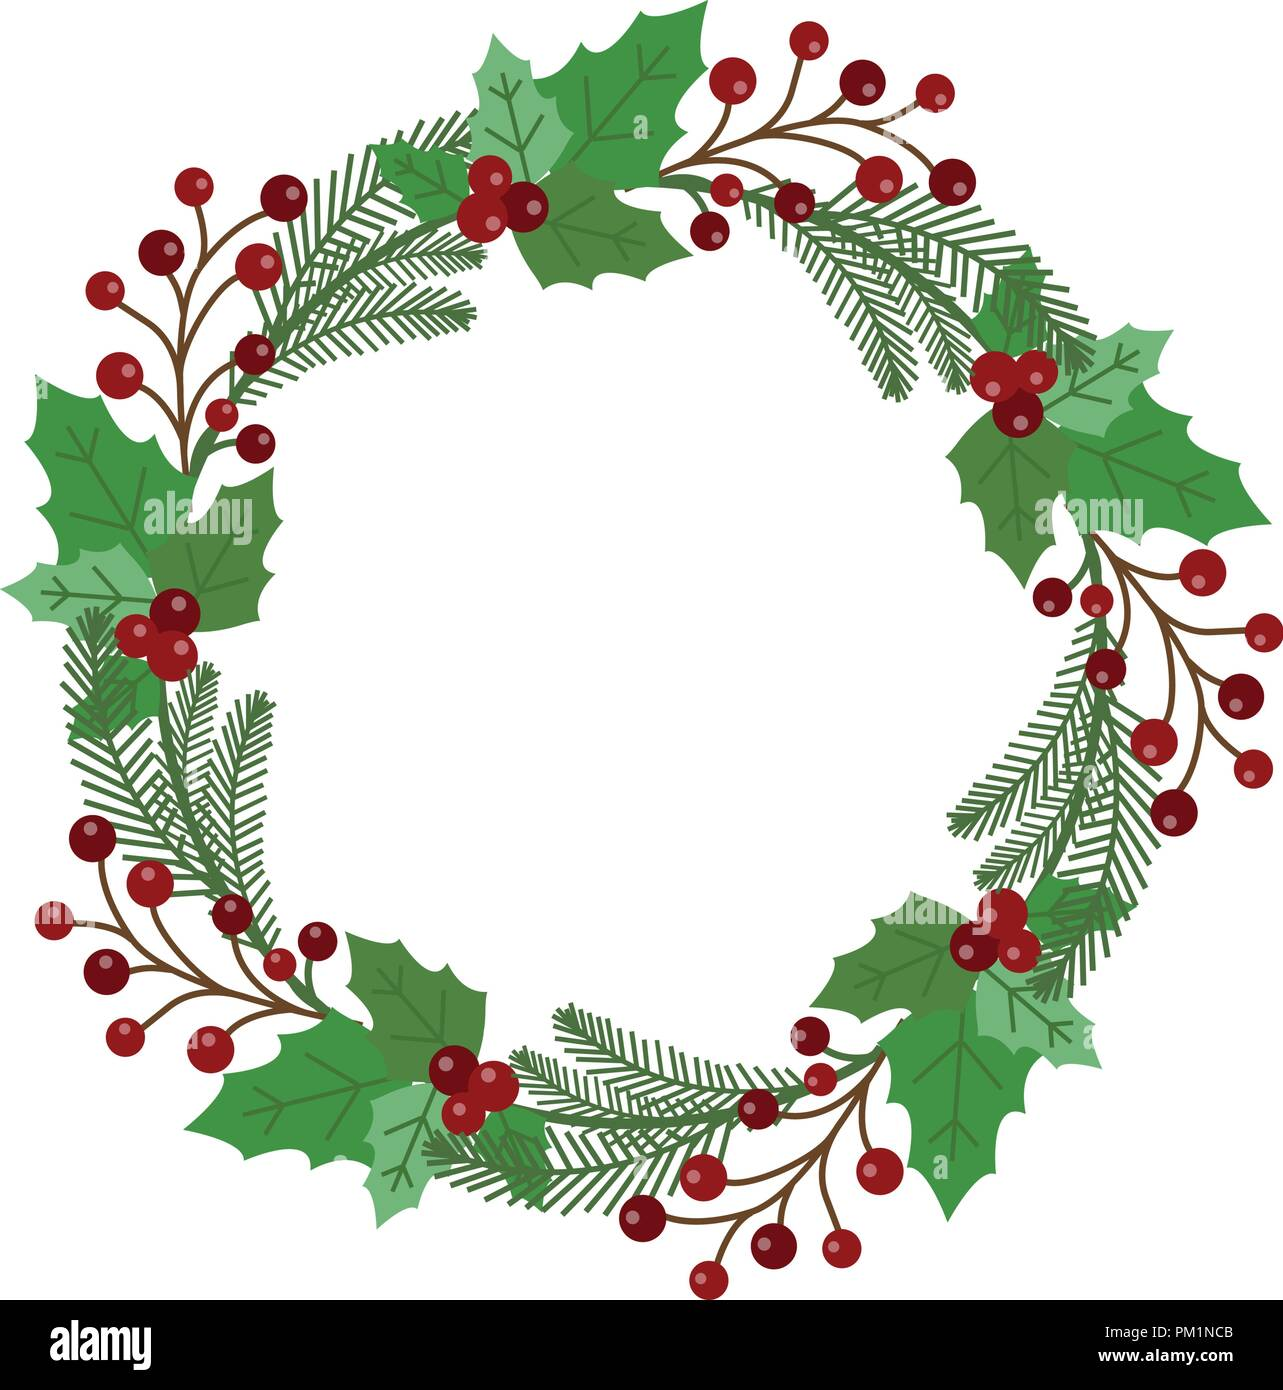 Christmas Holiday Wreath Icon Stock Vector Image Art Alamy